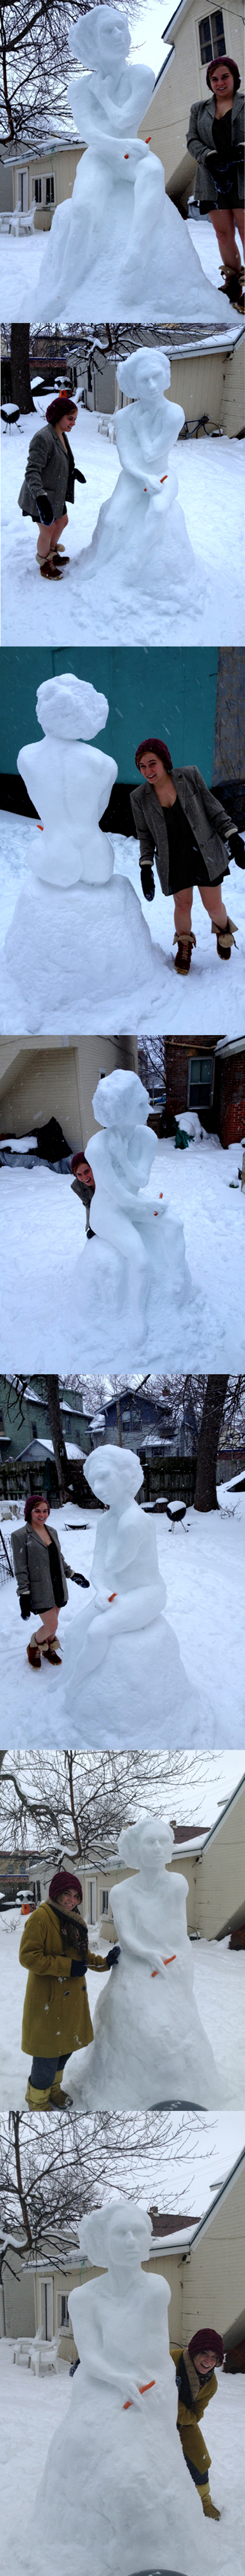 Snow Woman Sculpture